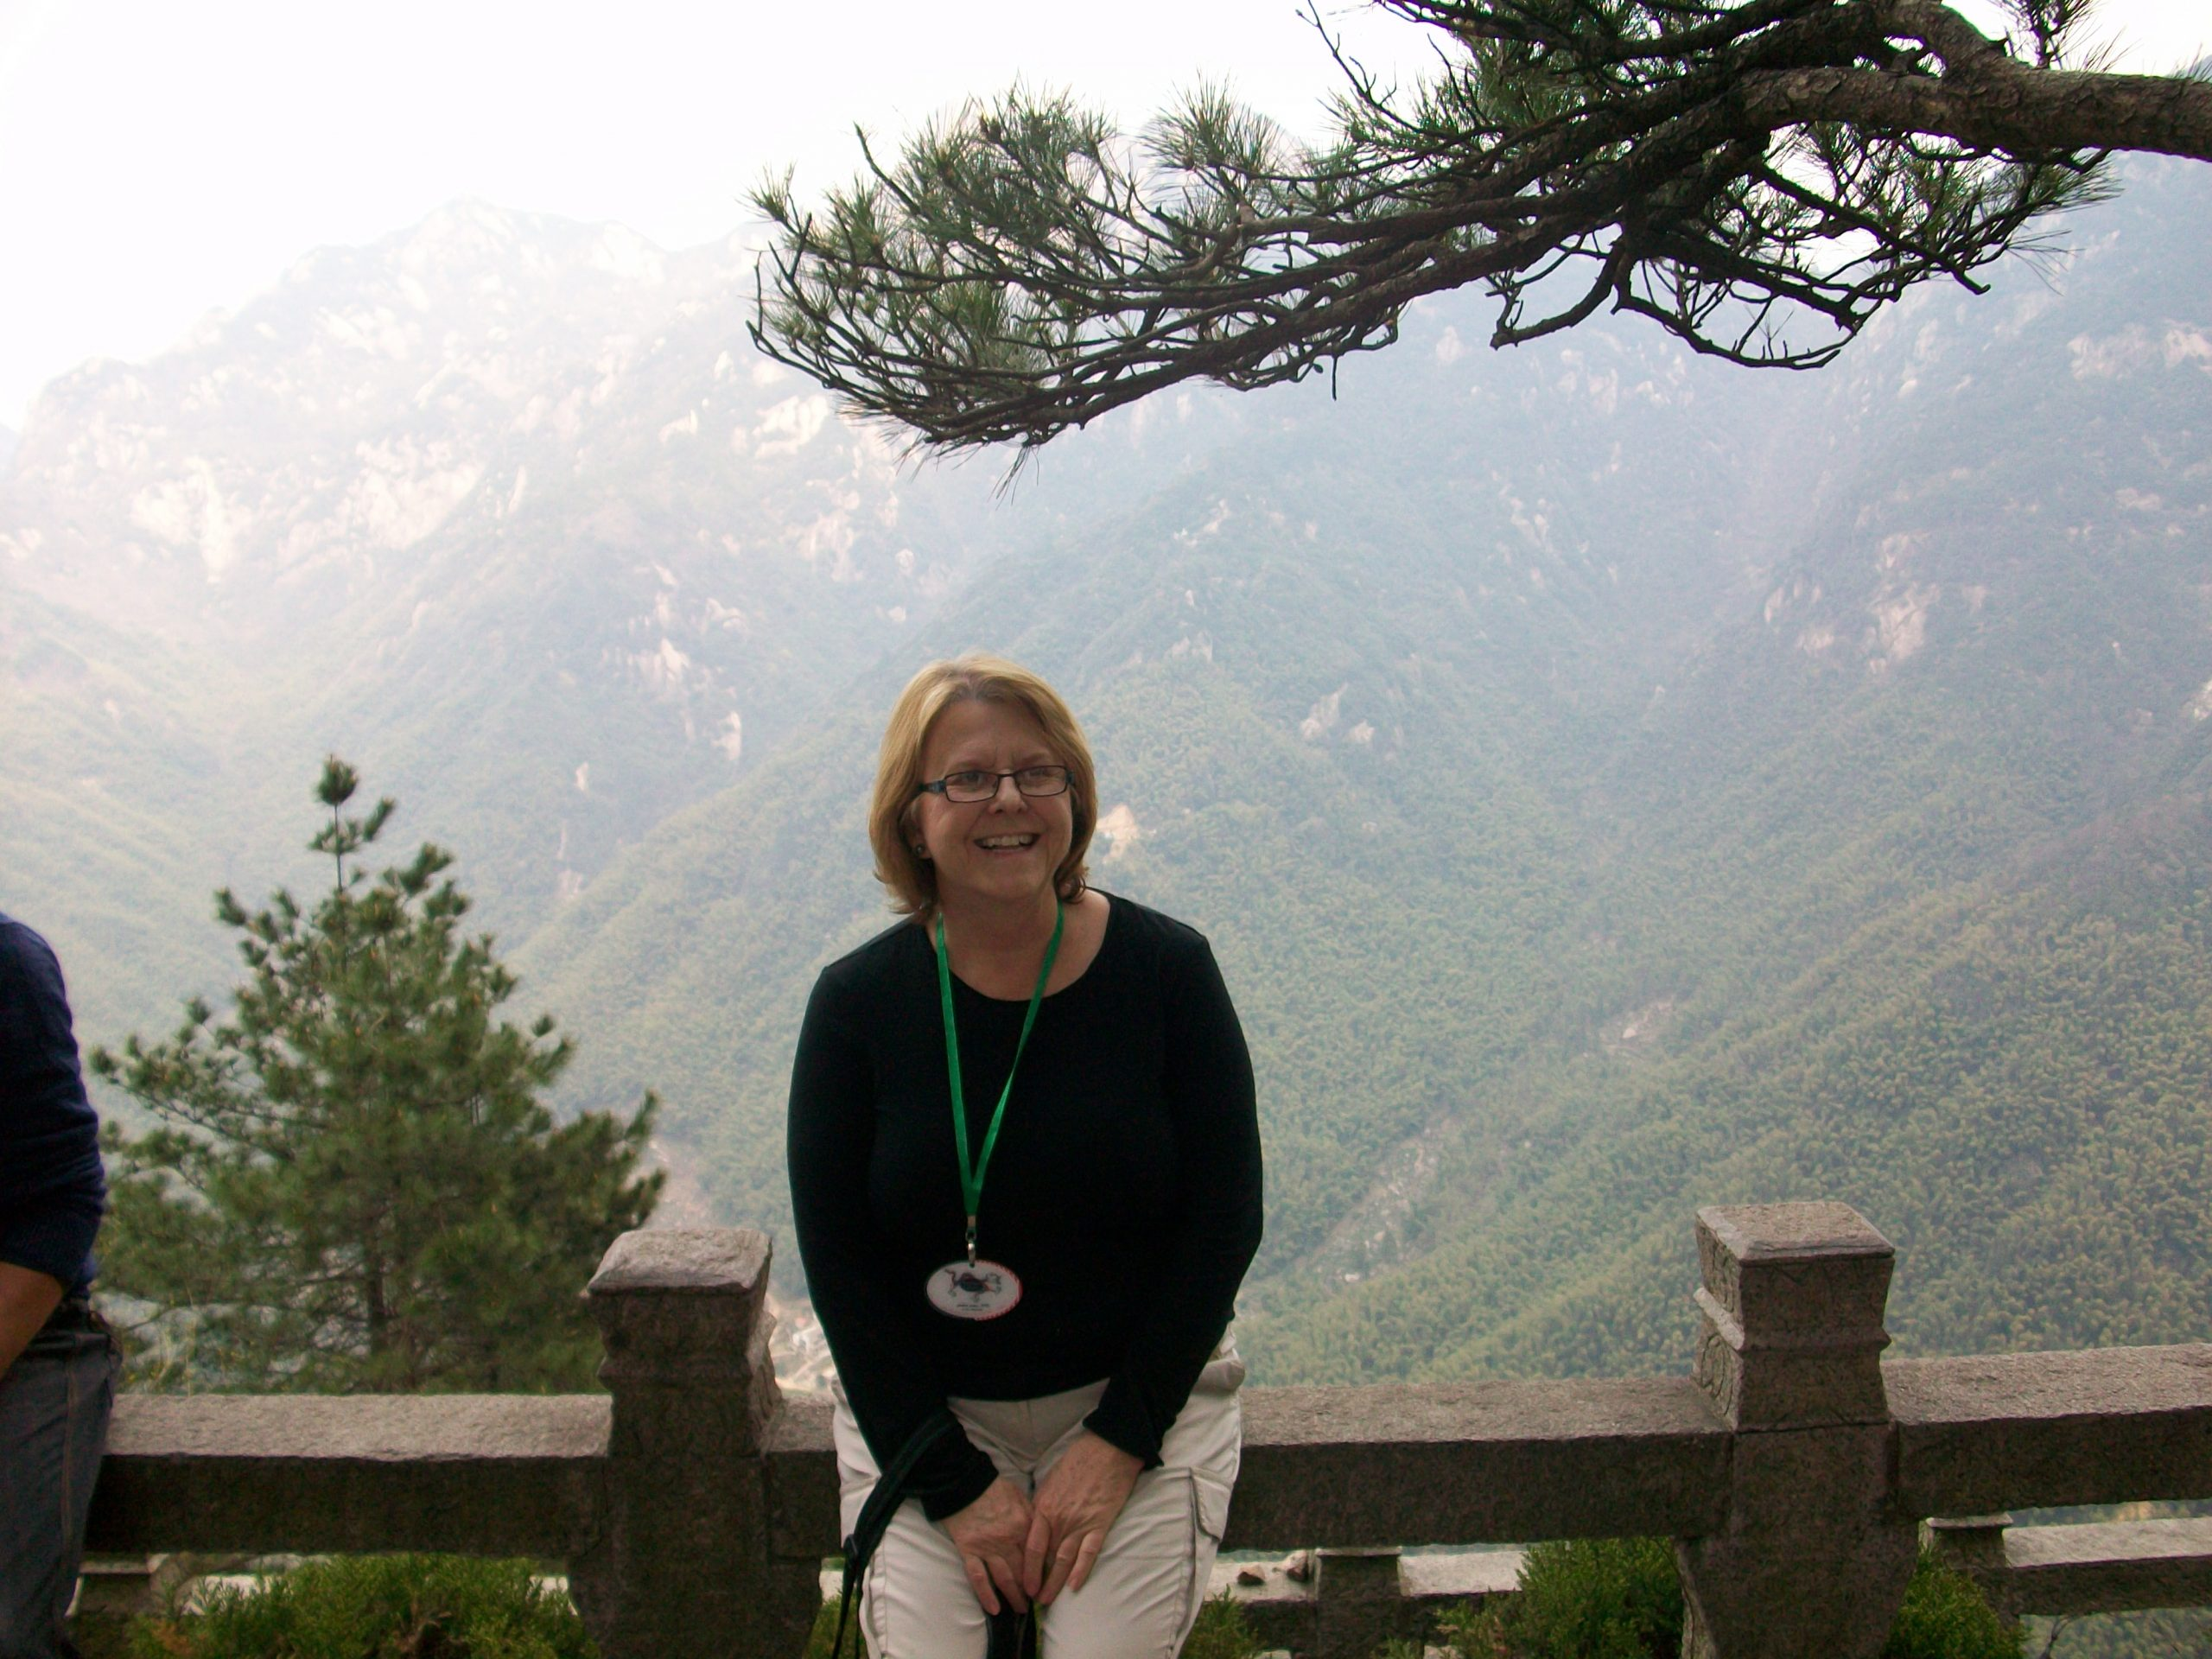 Carol Fox, Fox Marketing Solutions, Fair Oaks, CA, USA